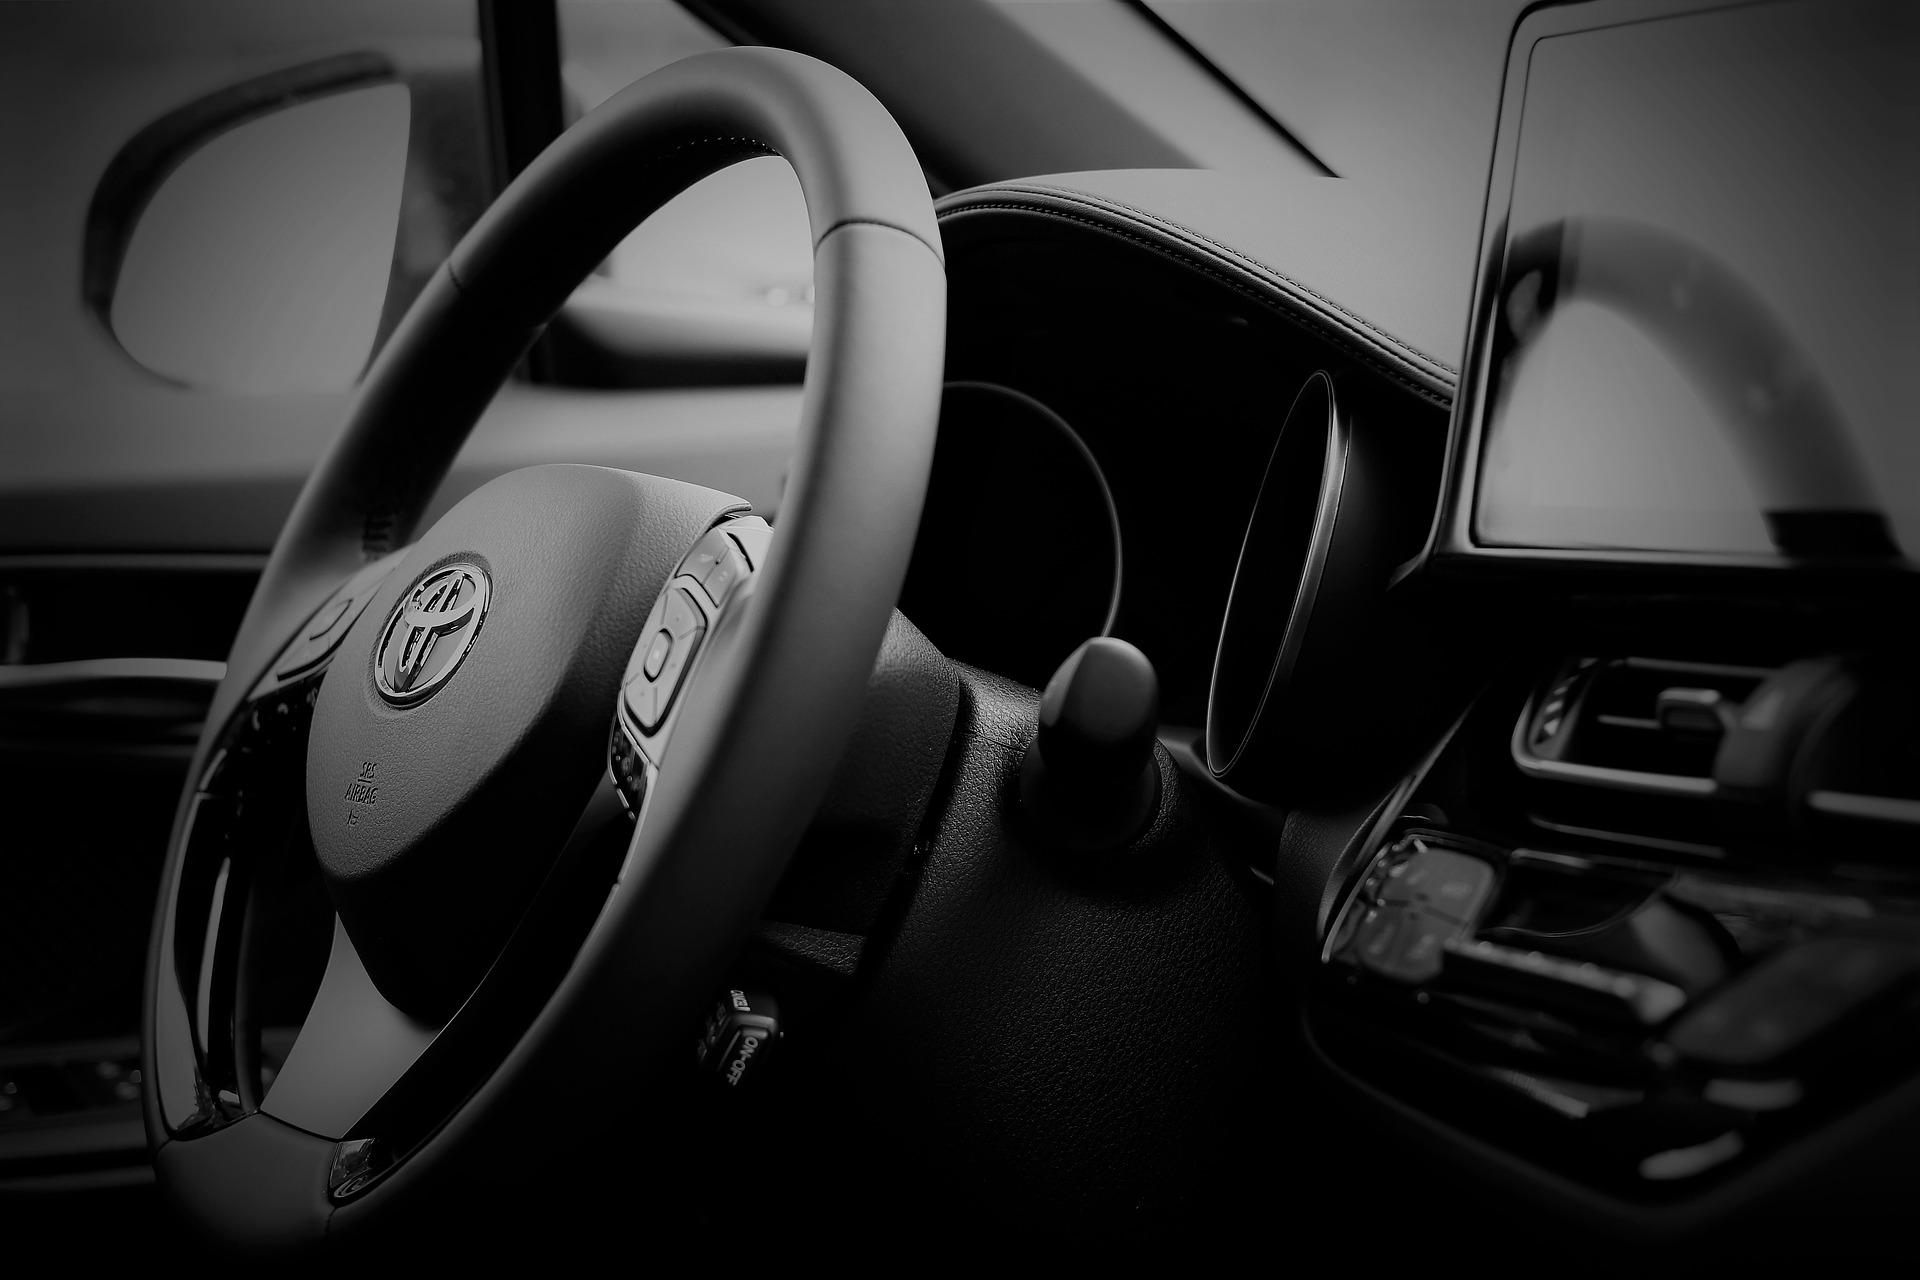 Toyota C-Hr Hybrid Car InteriorToyota C-Hr Hybrid Car Interior